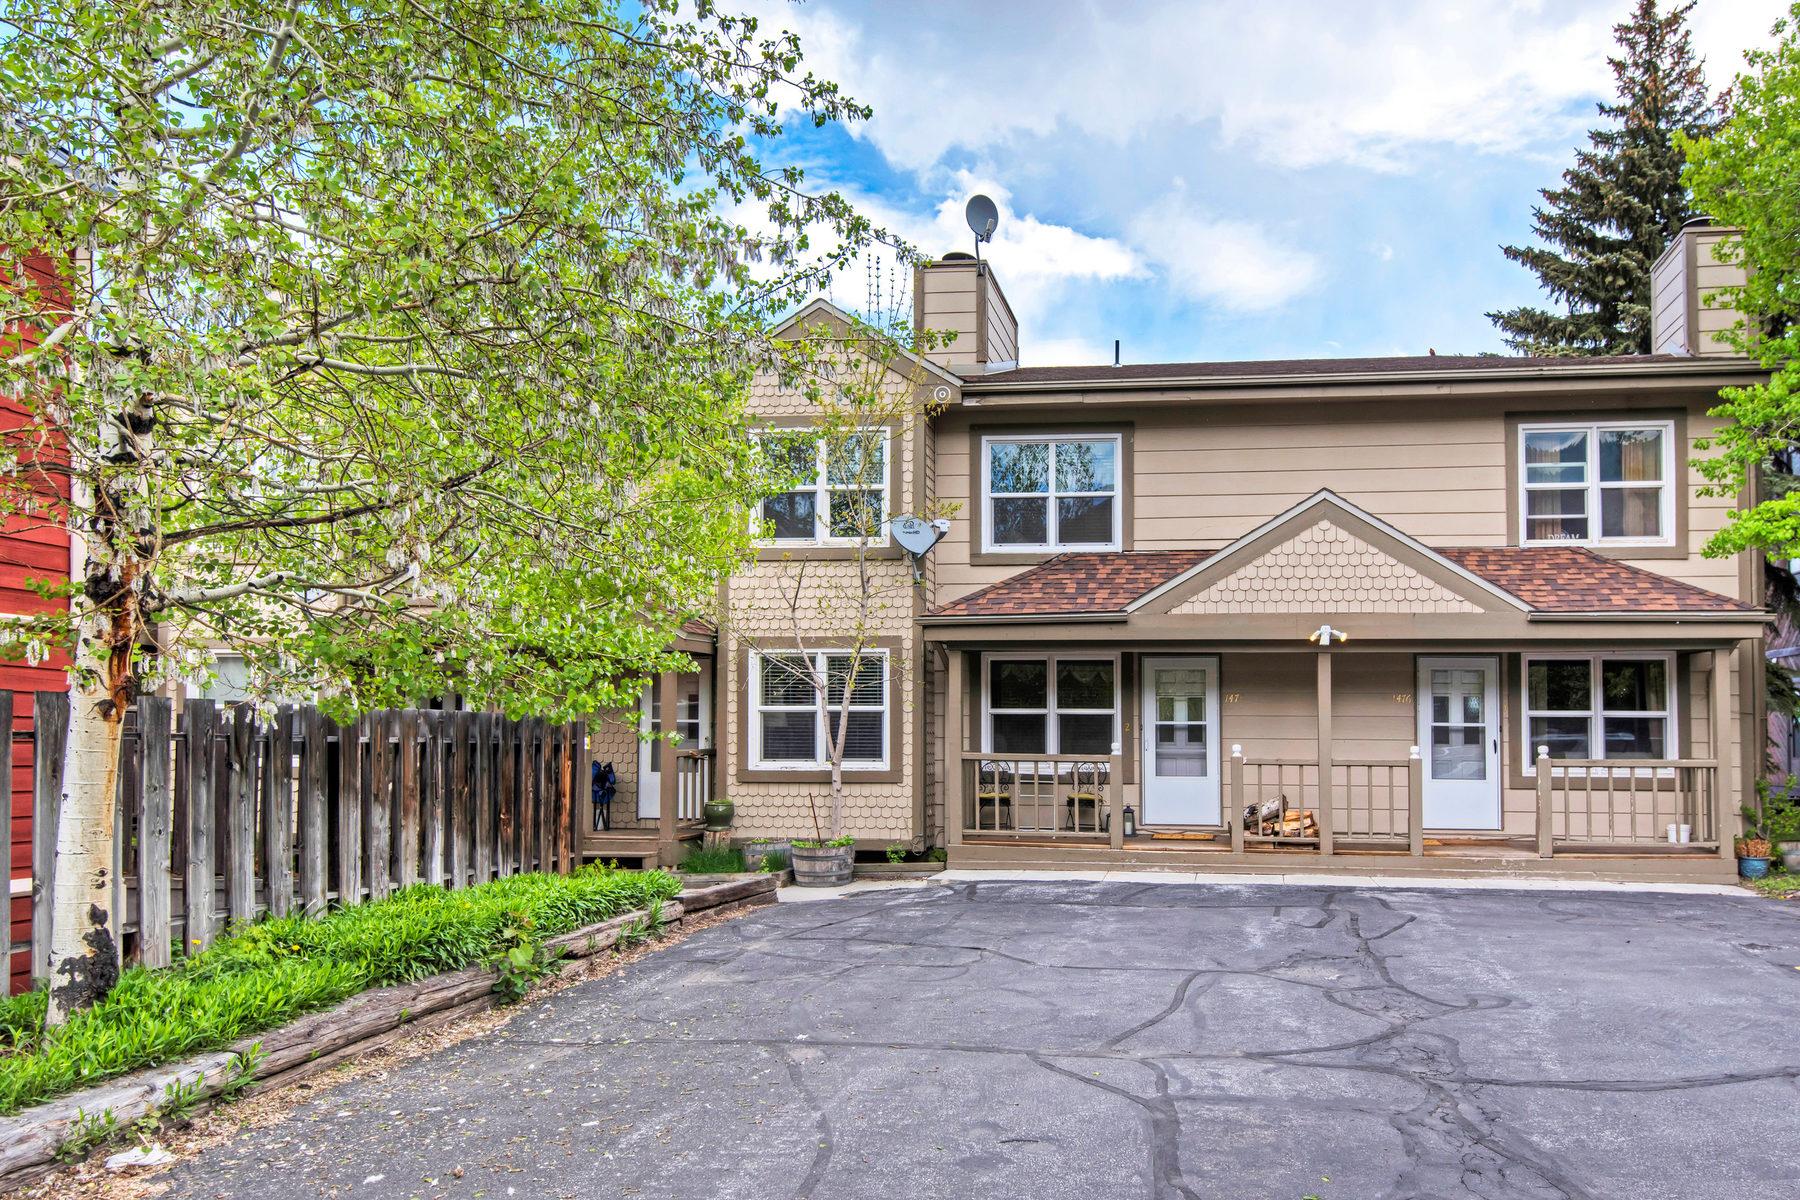 Nhà phố vì Bán tại Adorable Townhouse In The Heart Of Old Town 1478 Park Ave #2 Park City, Utah, 84060 Hoa Kỳ